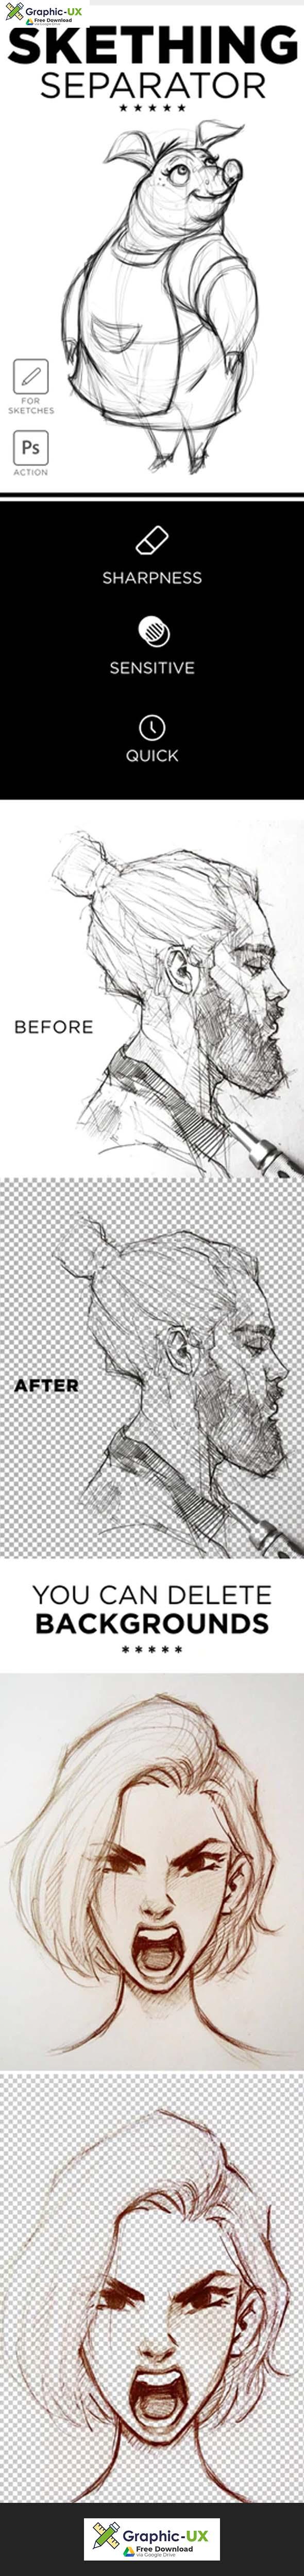 Sketching Separator Photoshop Action